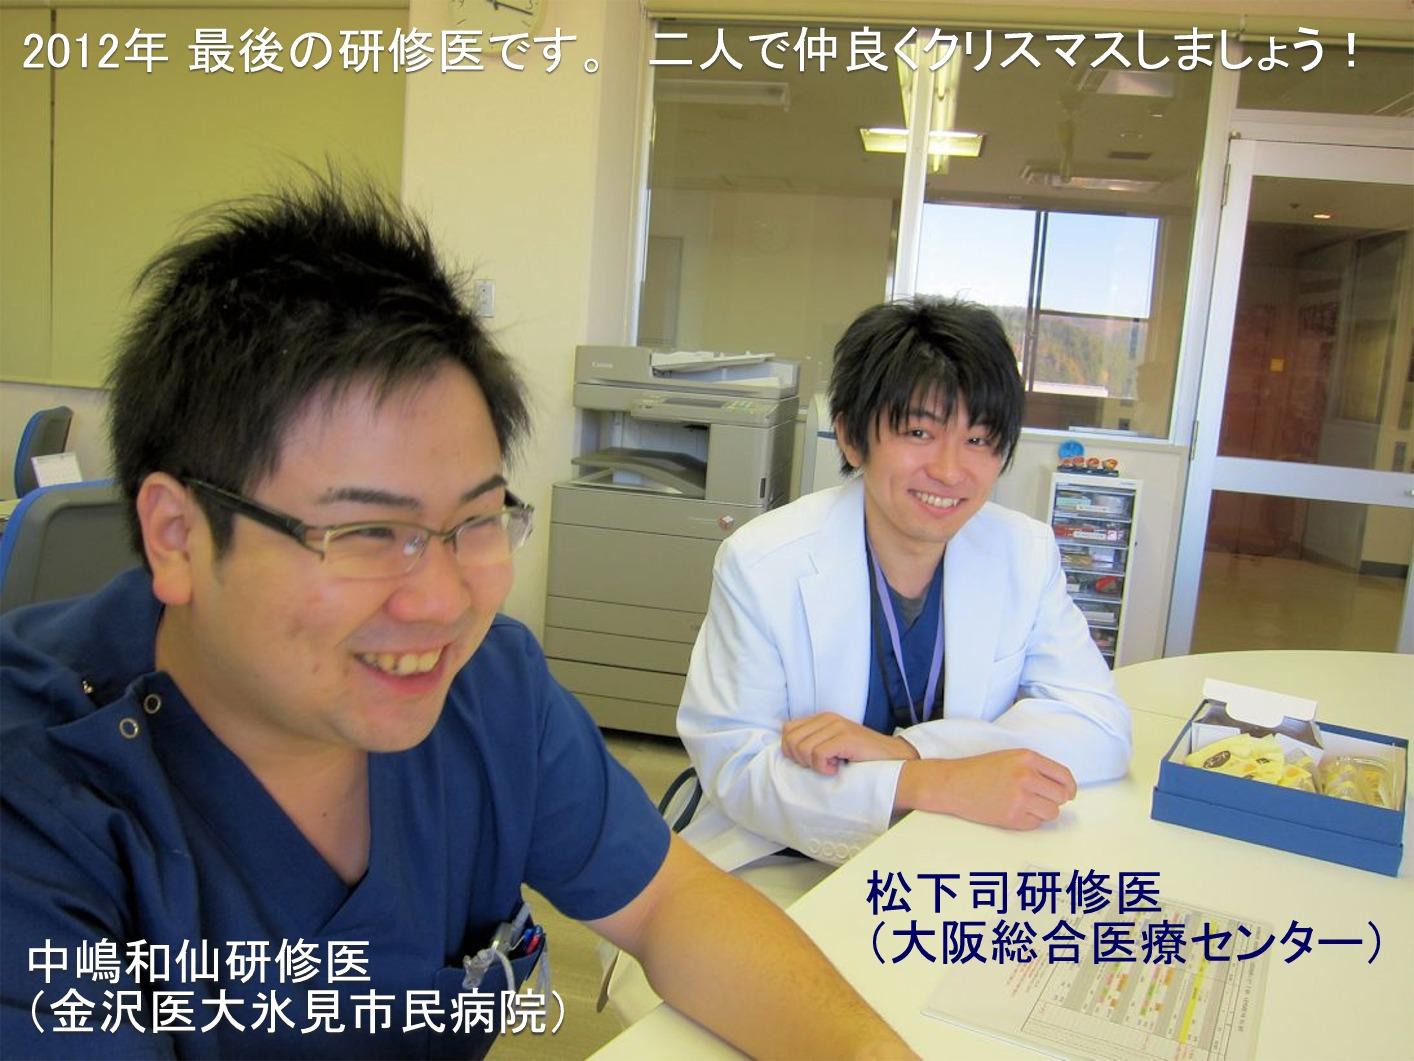 20121201kensyui.jpg